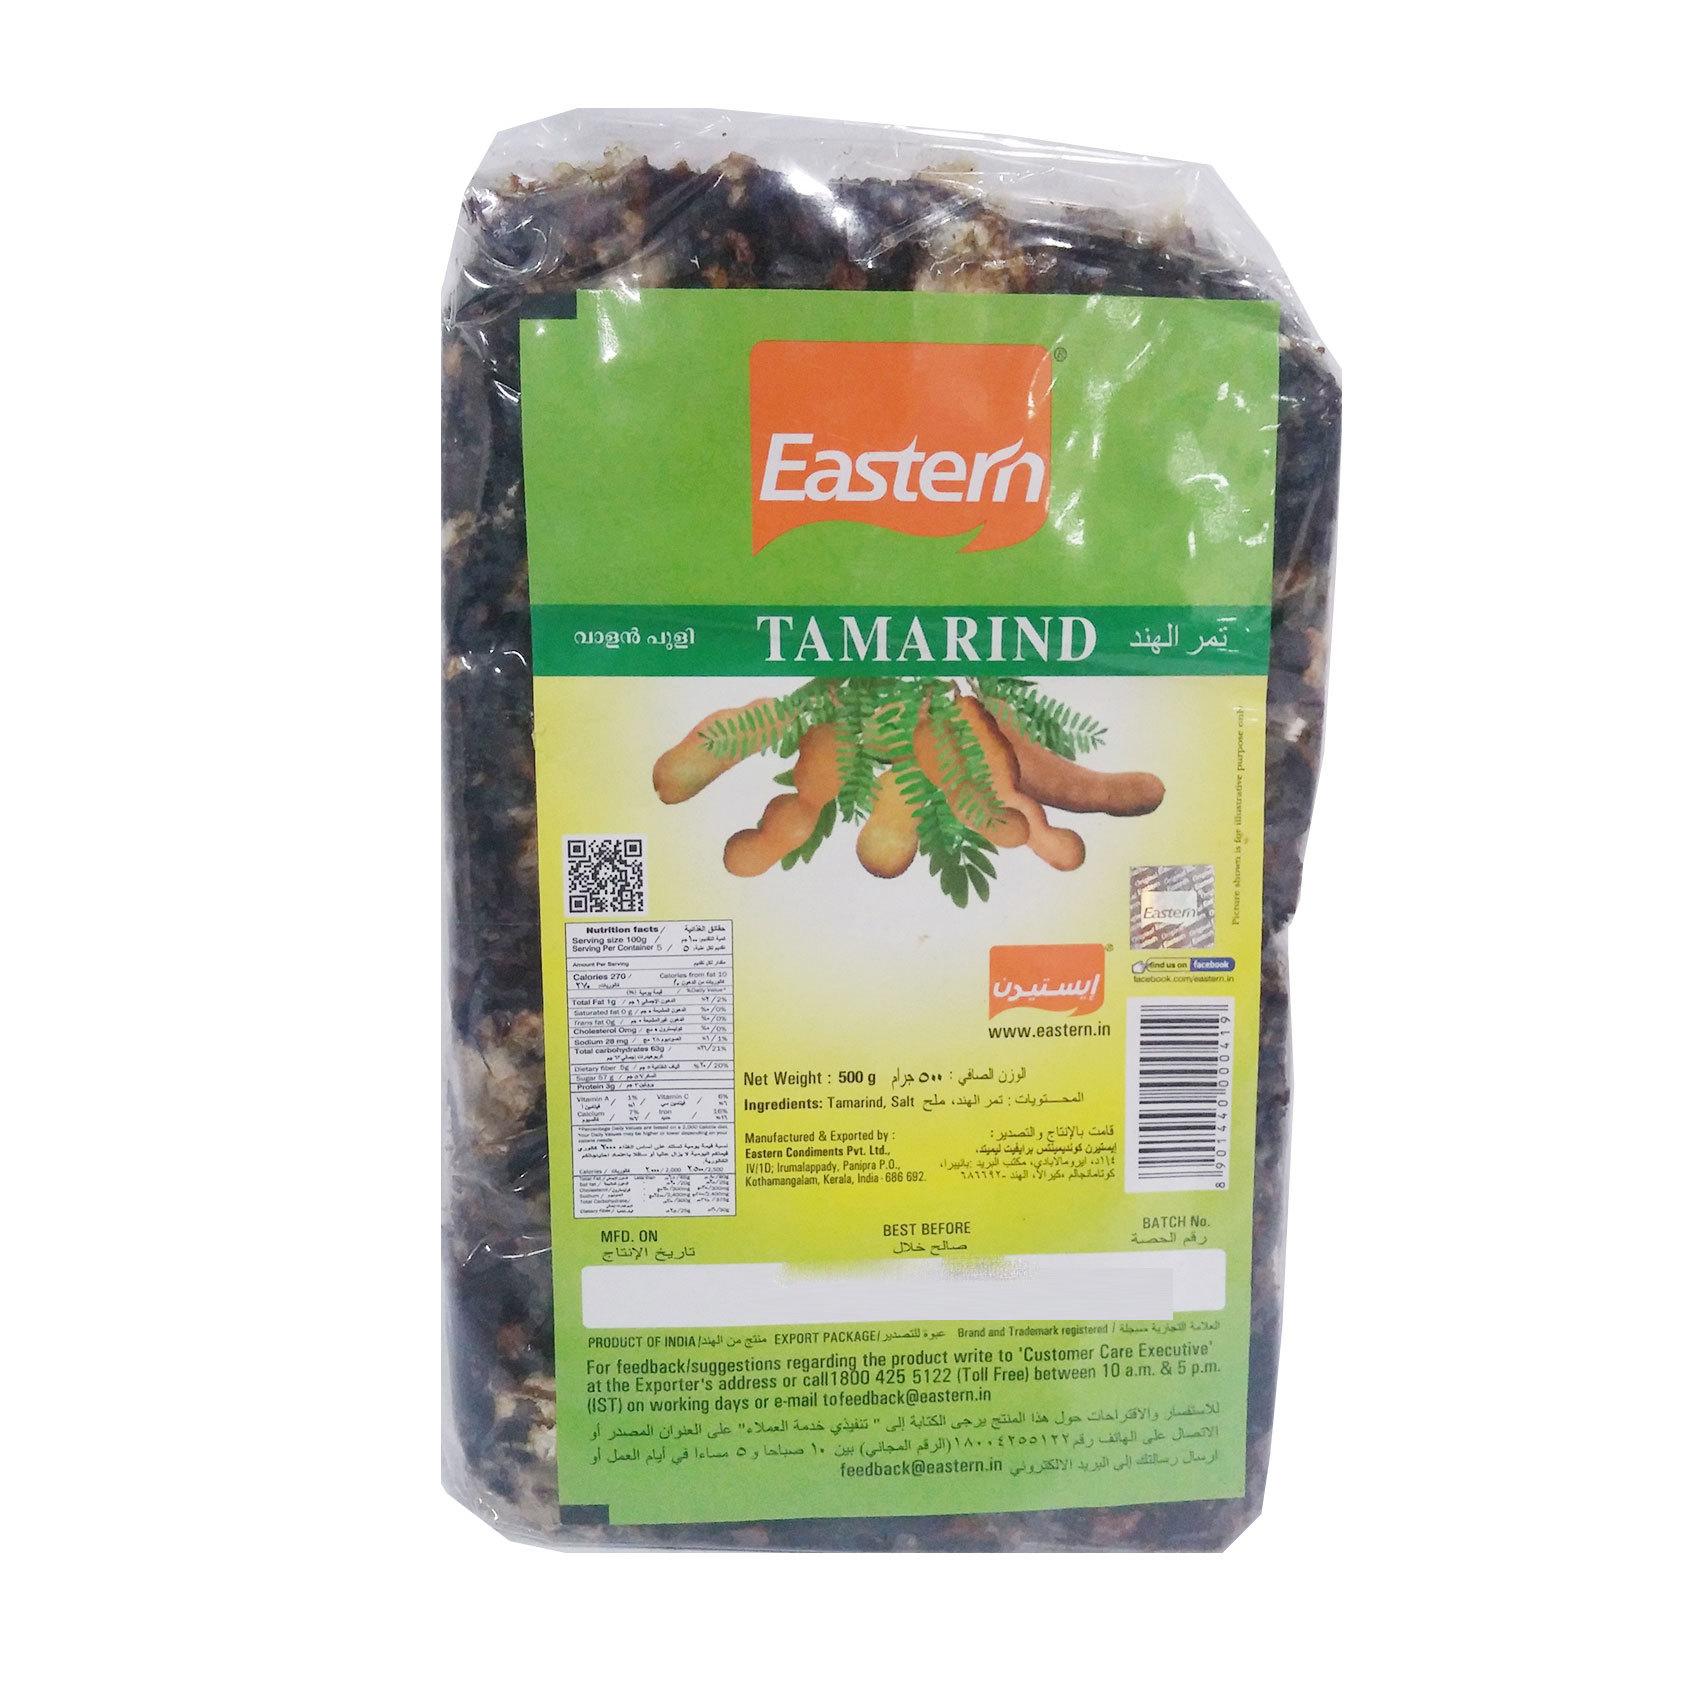 EASTERN TAMARIND 500GR